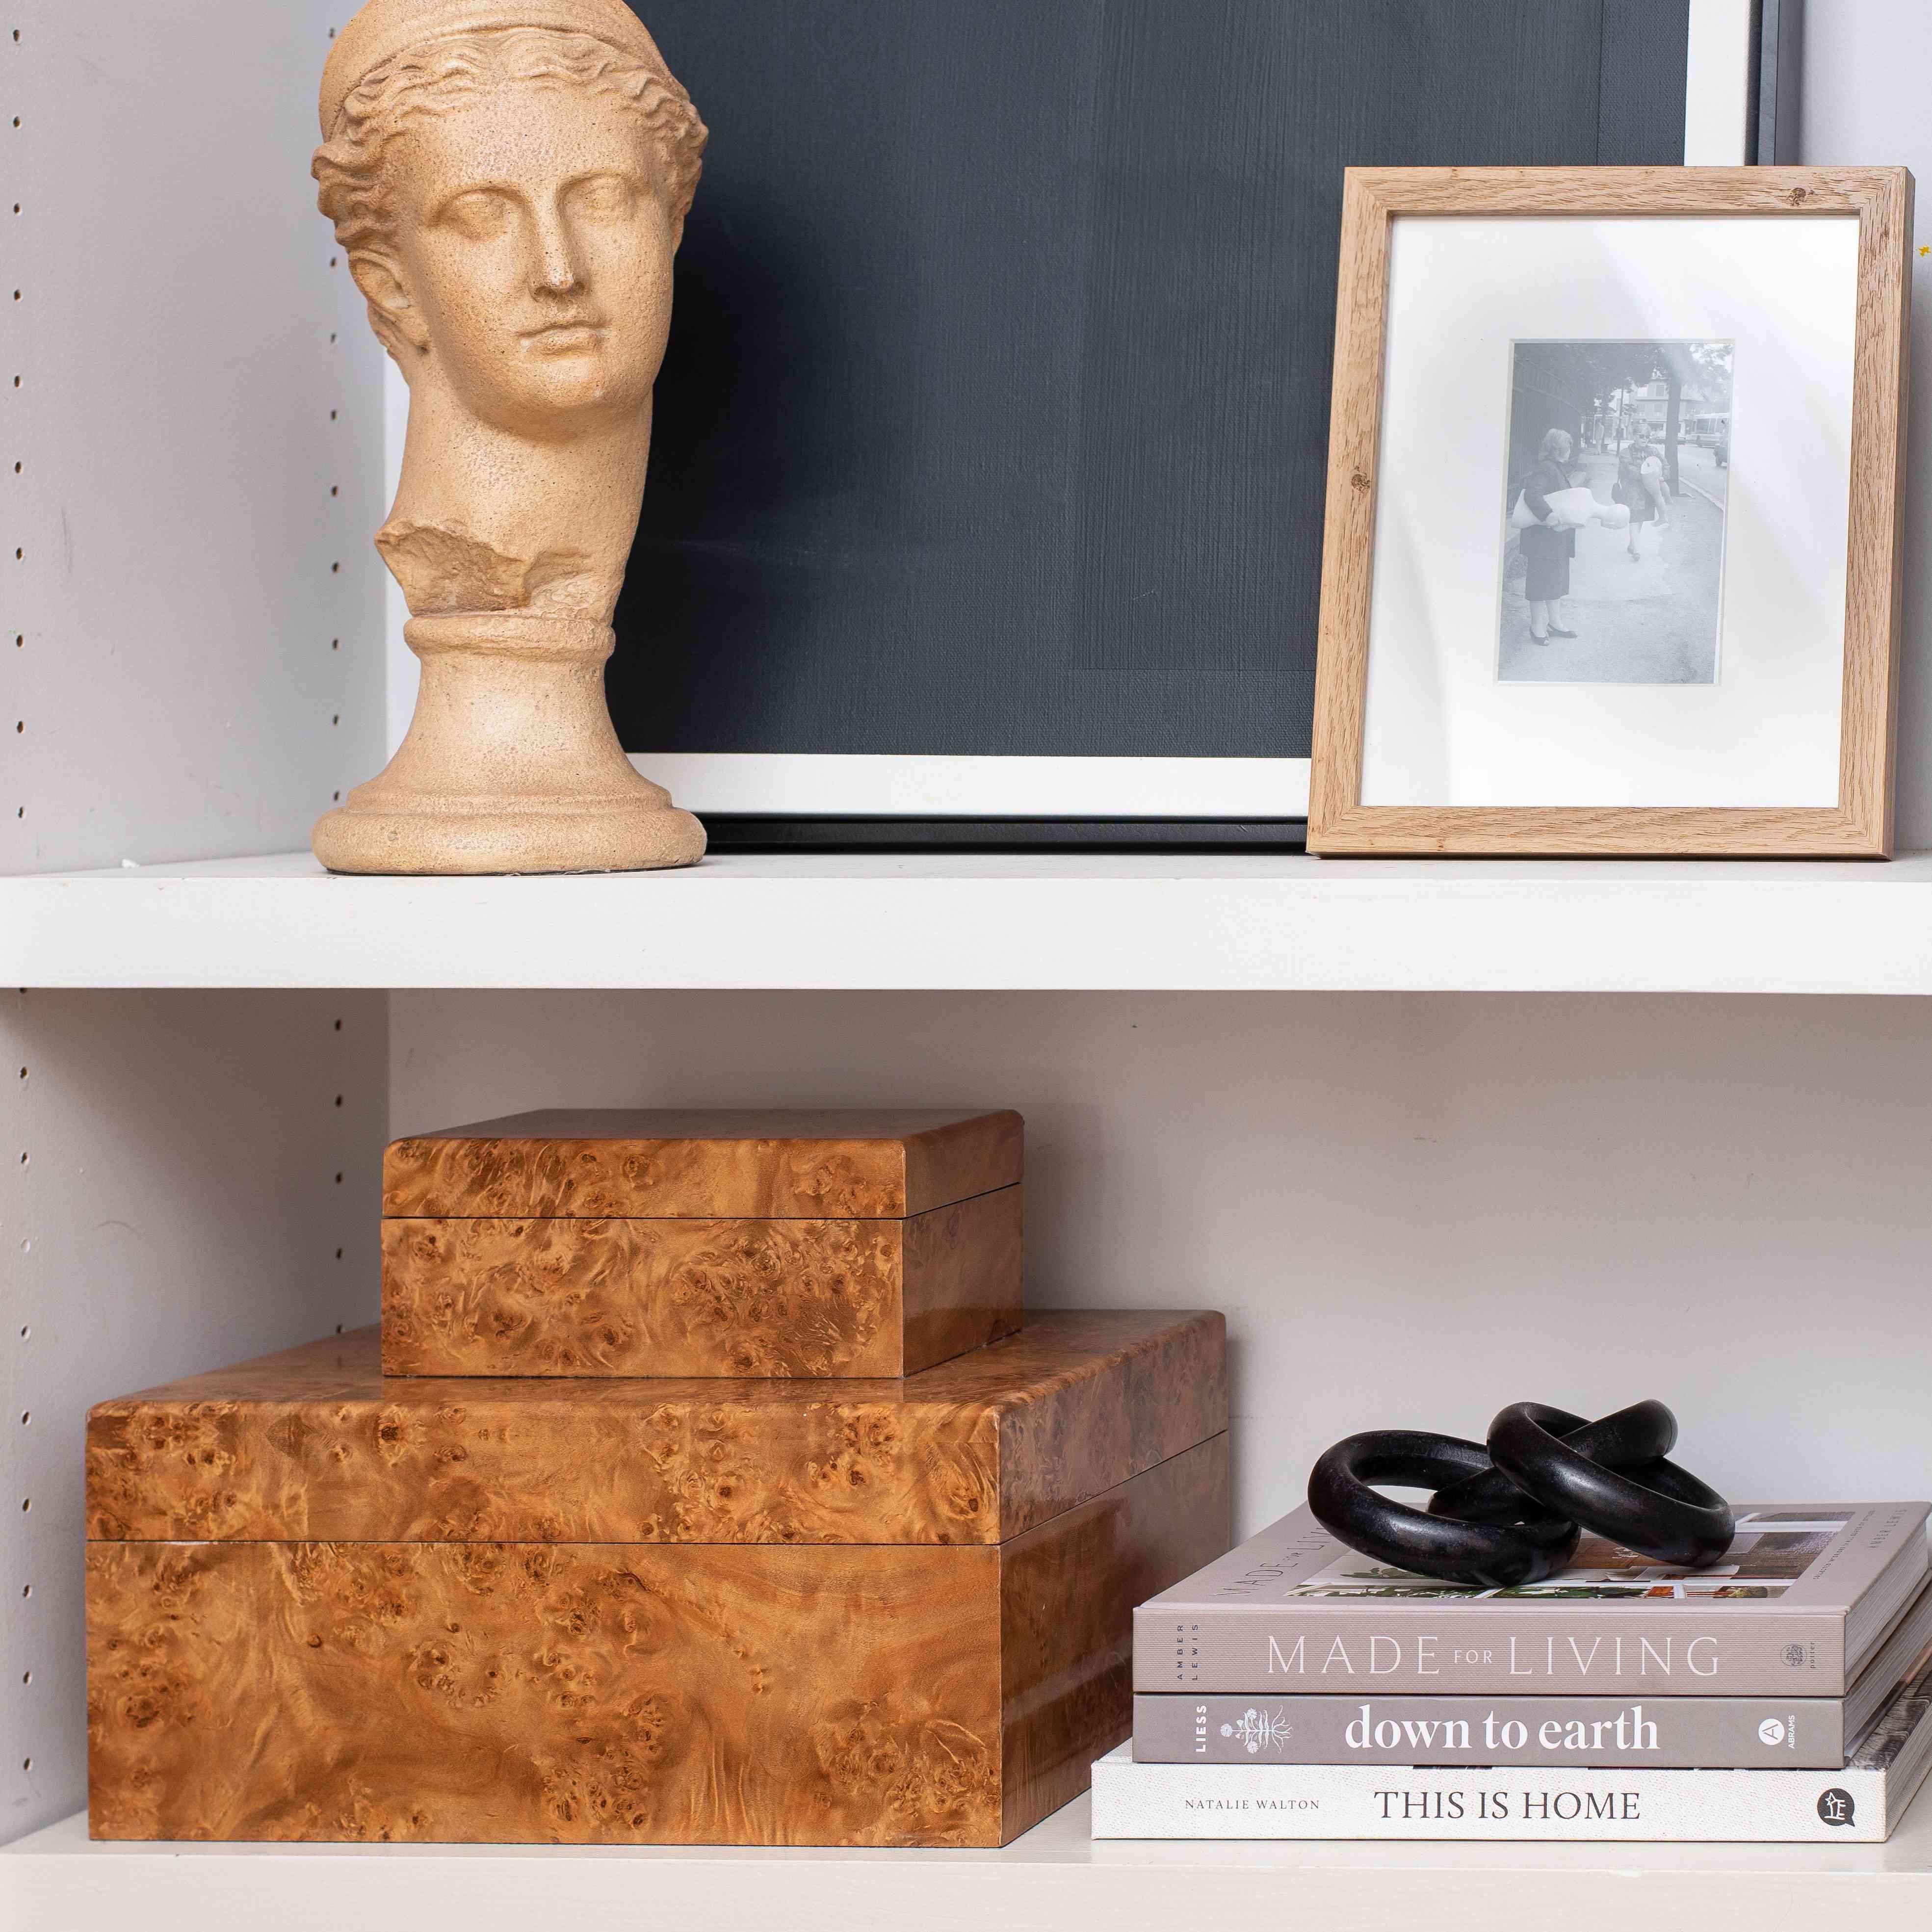 Burl wood boxes on top of shelf.